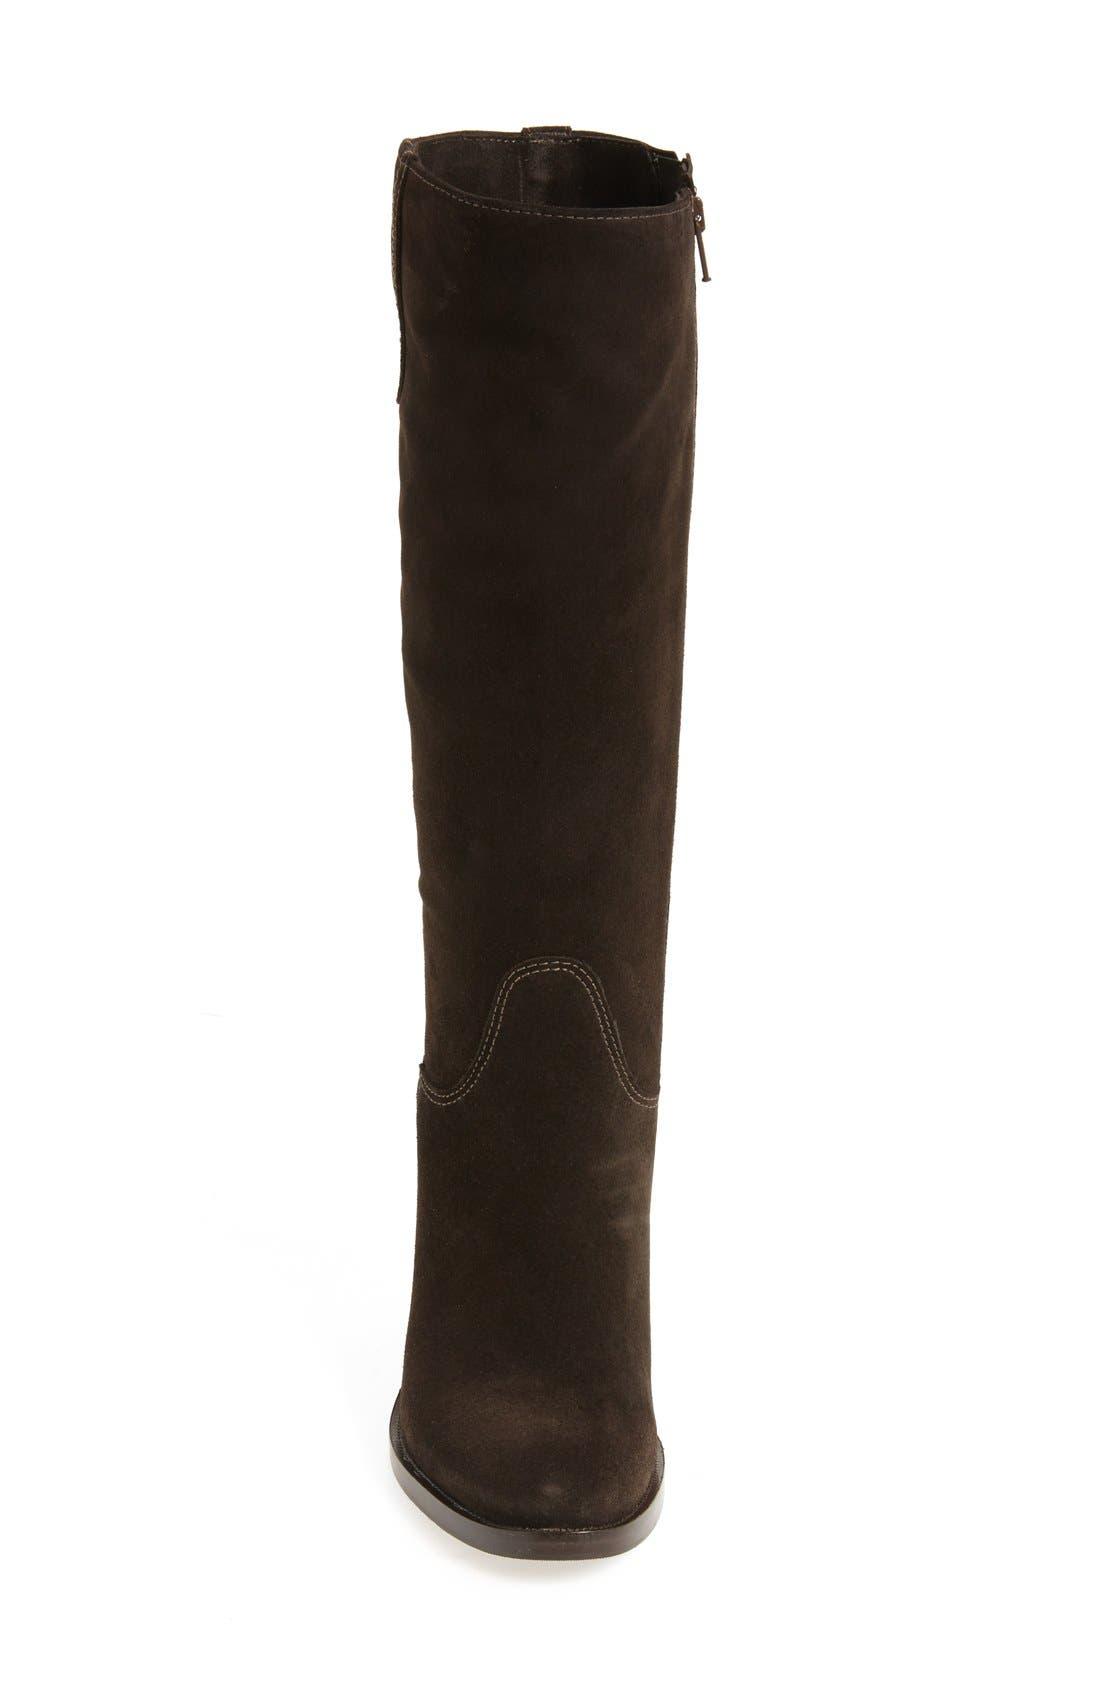 Alternate Image 3  - La Canadienne 'Polly' Waterproof Knee High Boot (Women)